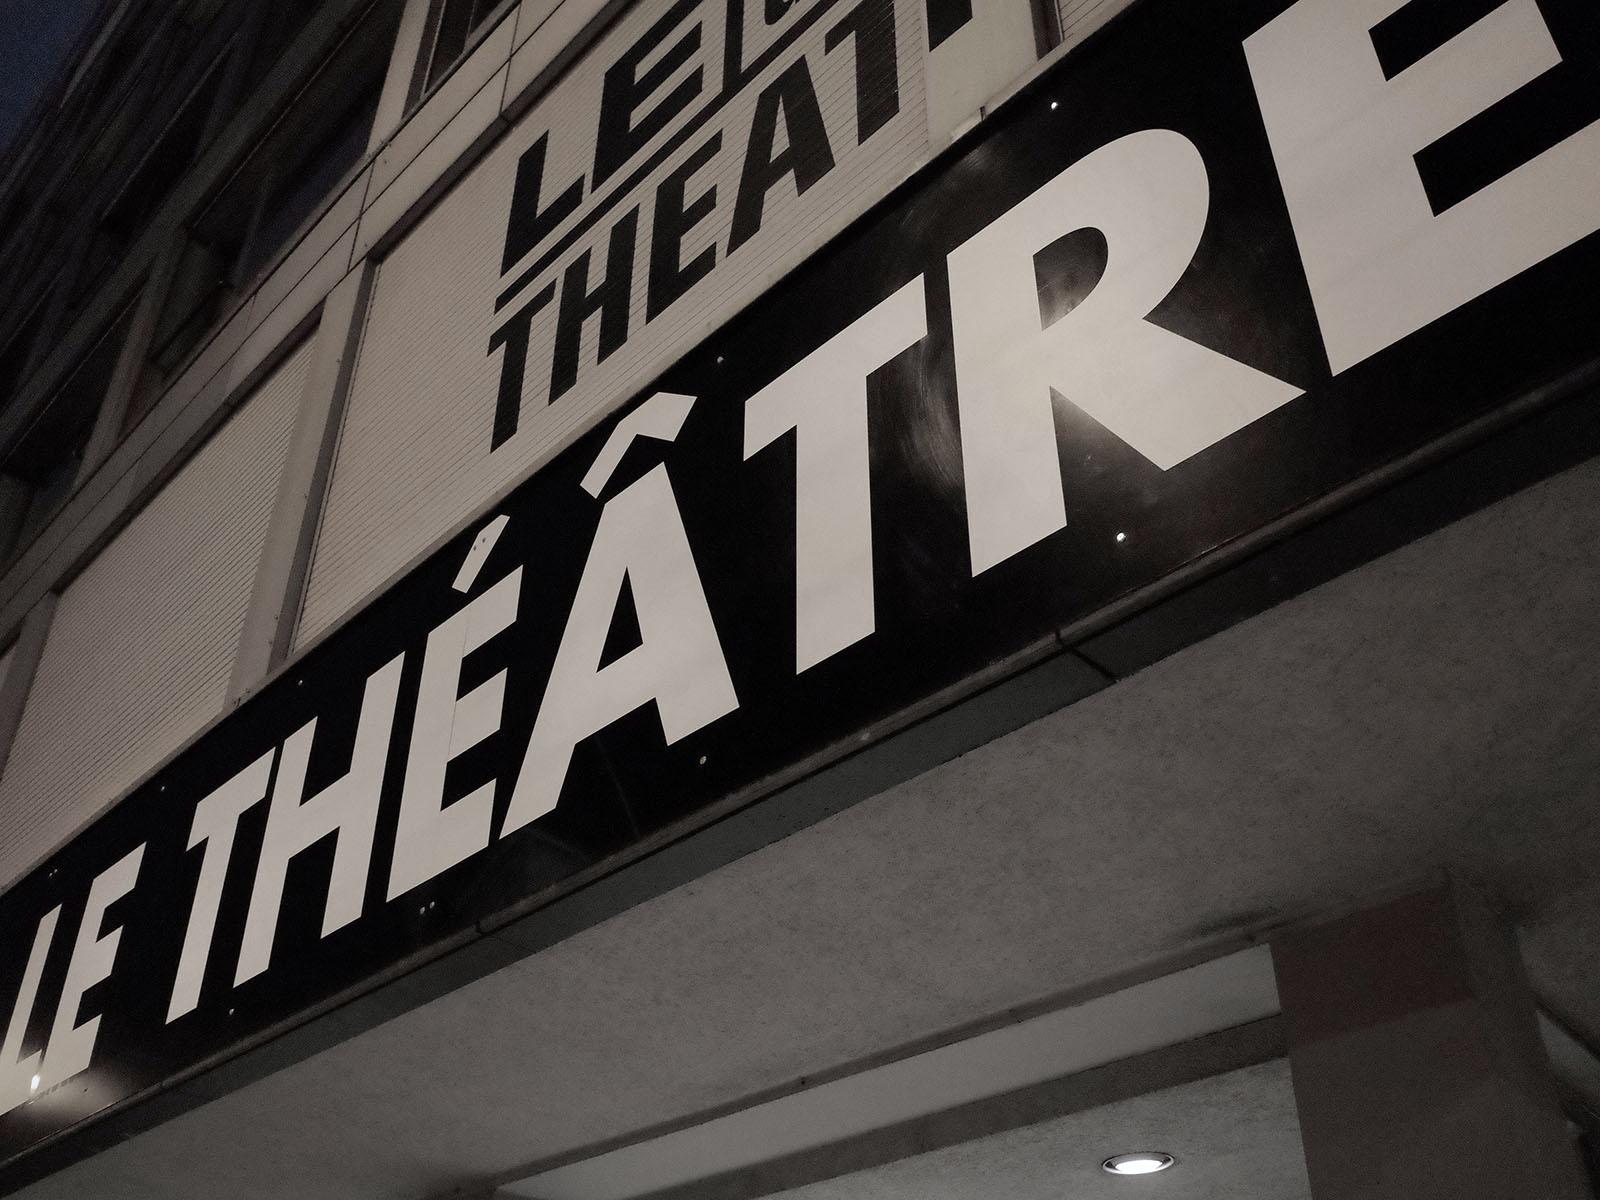 le theatre enseigne